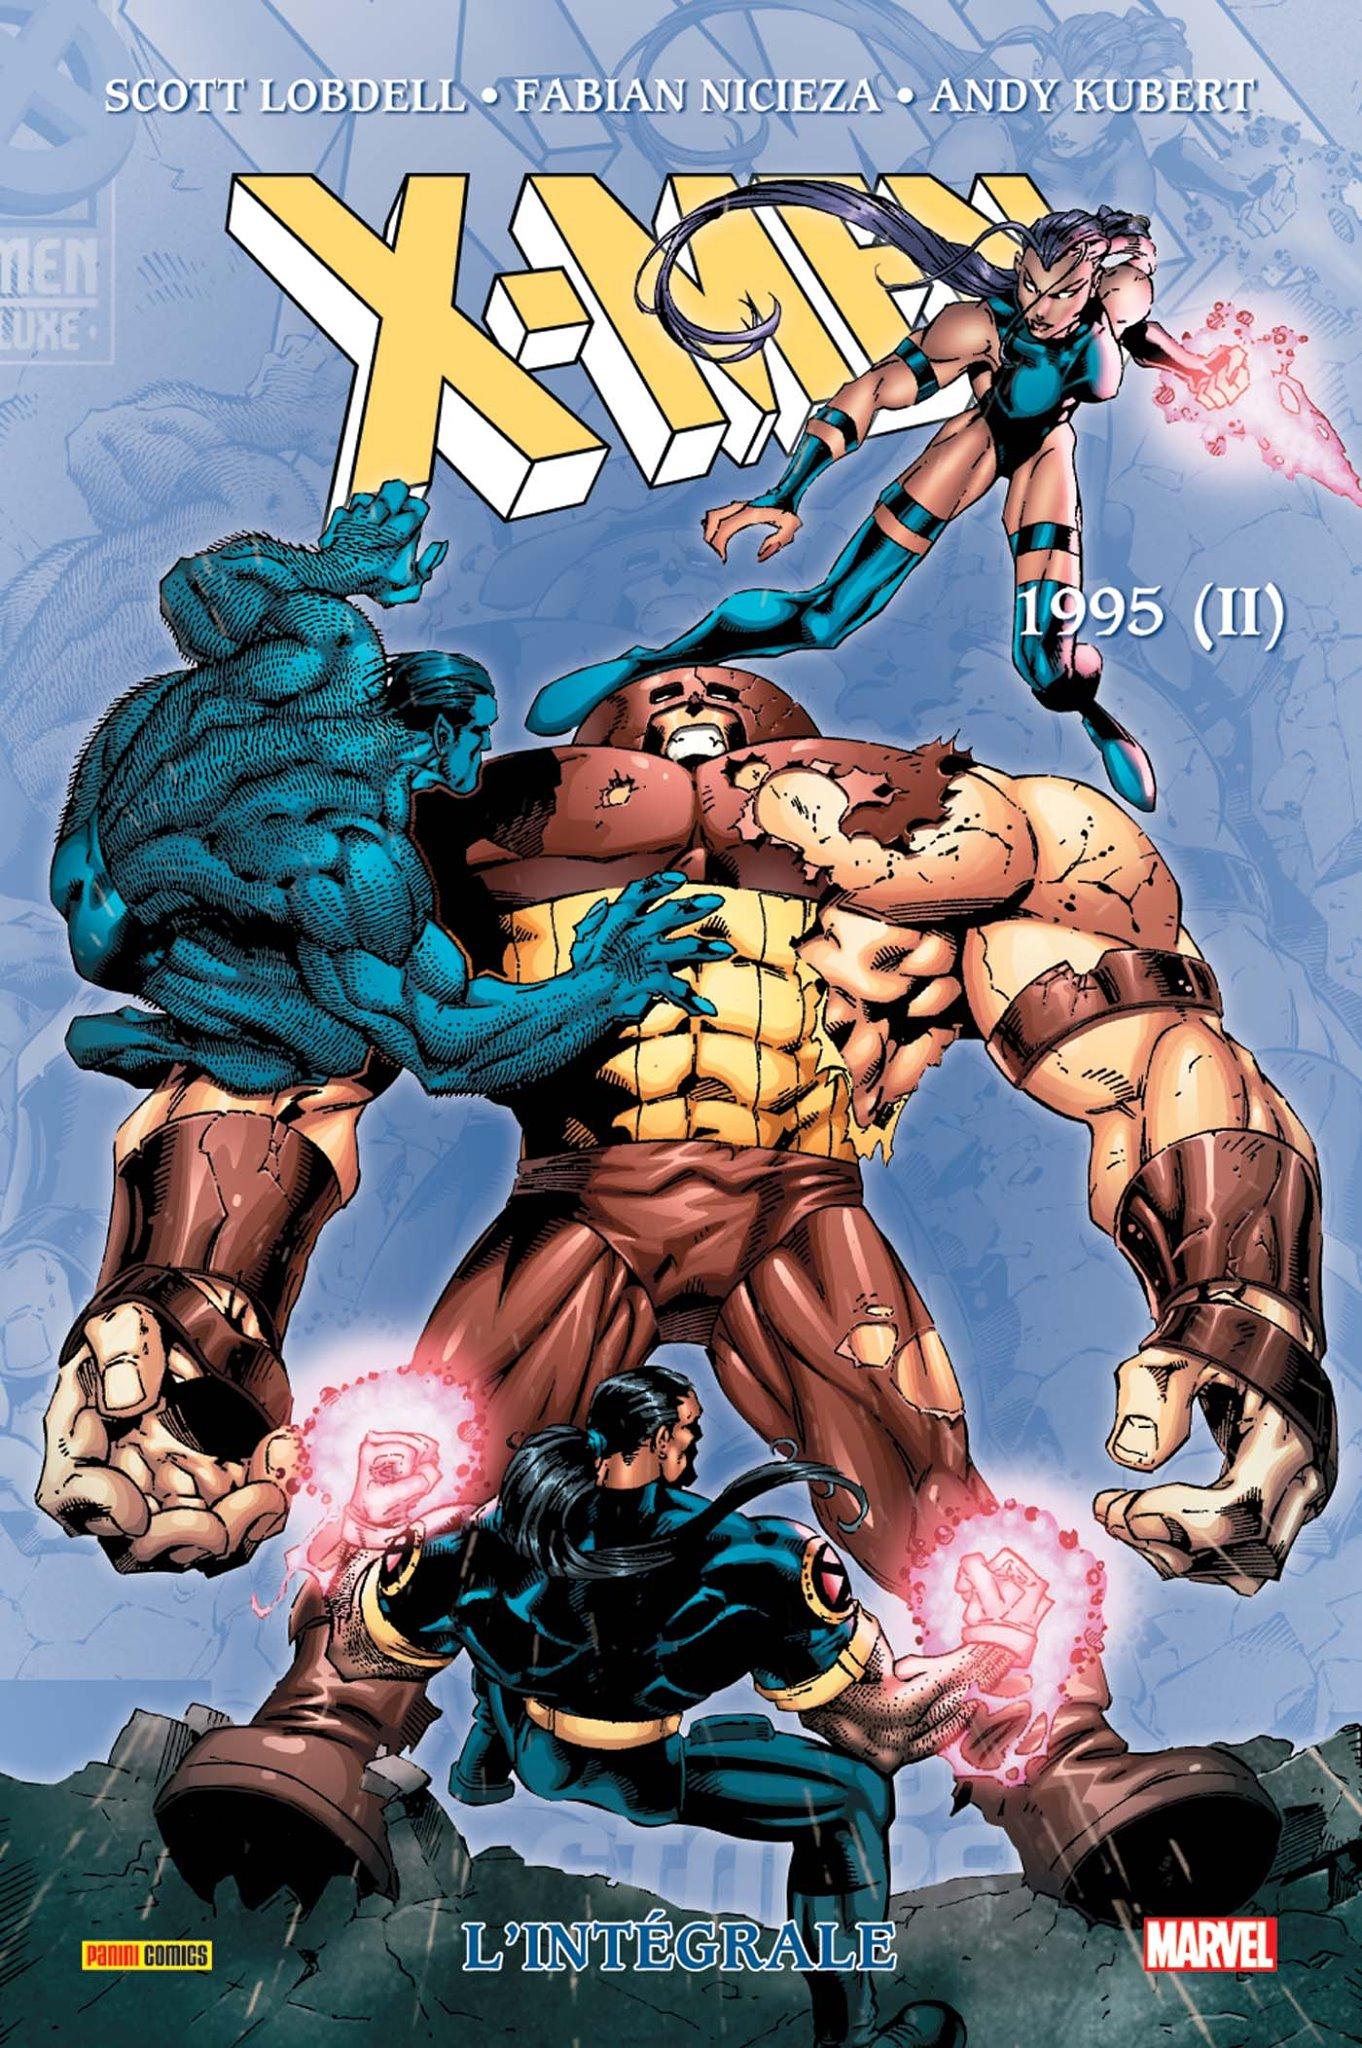 X-MEN : L'INTÉGRALE 1995 (II)